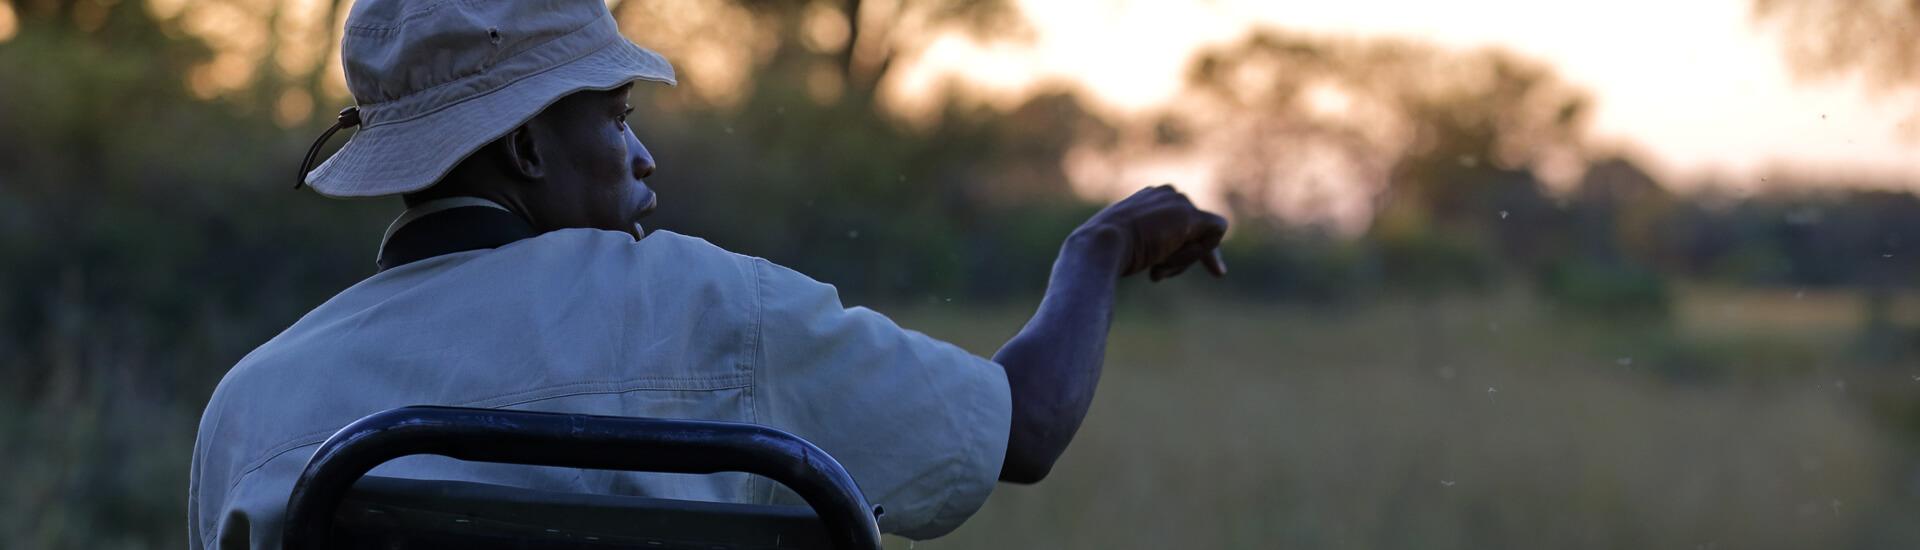 Botswana Reisen oftmals mit Tracker.